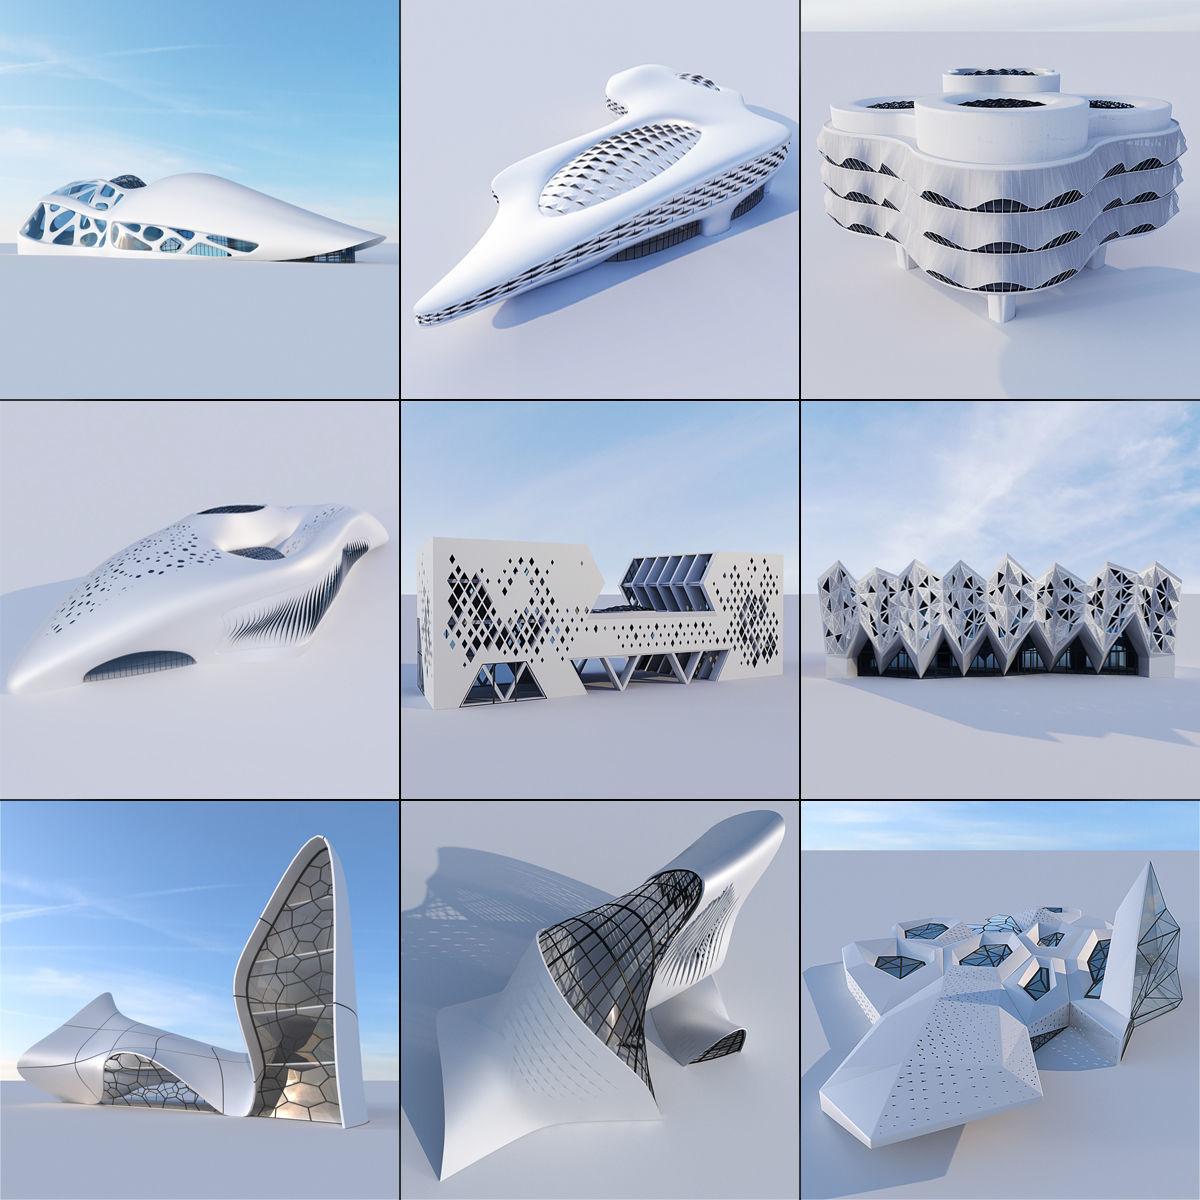 Futuristic building collection